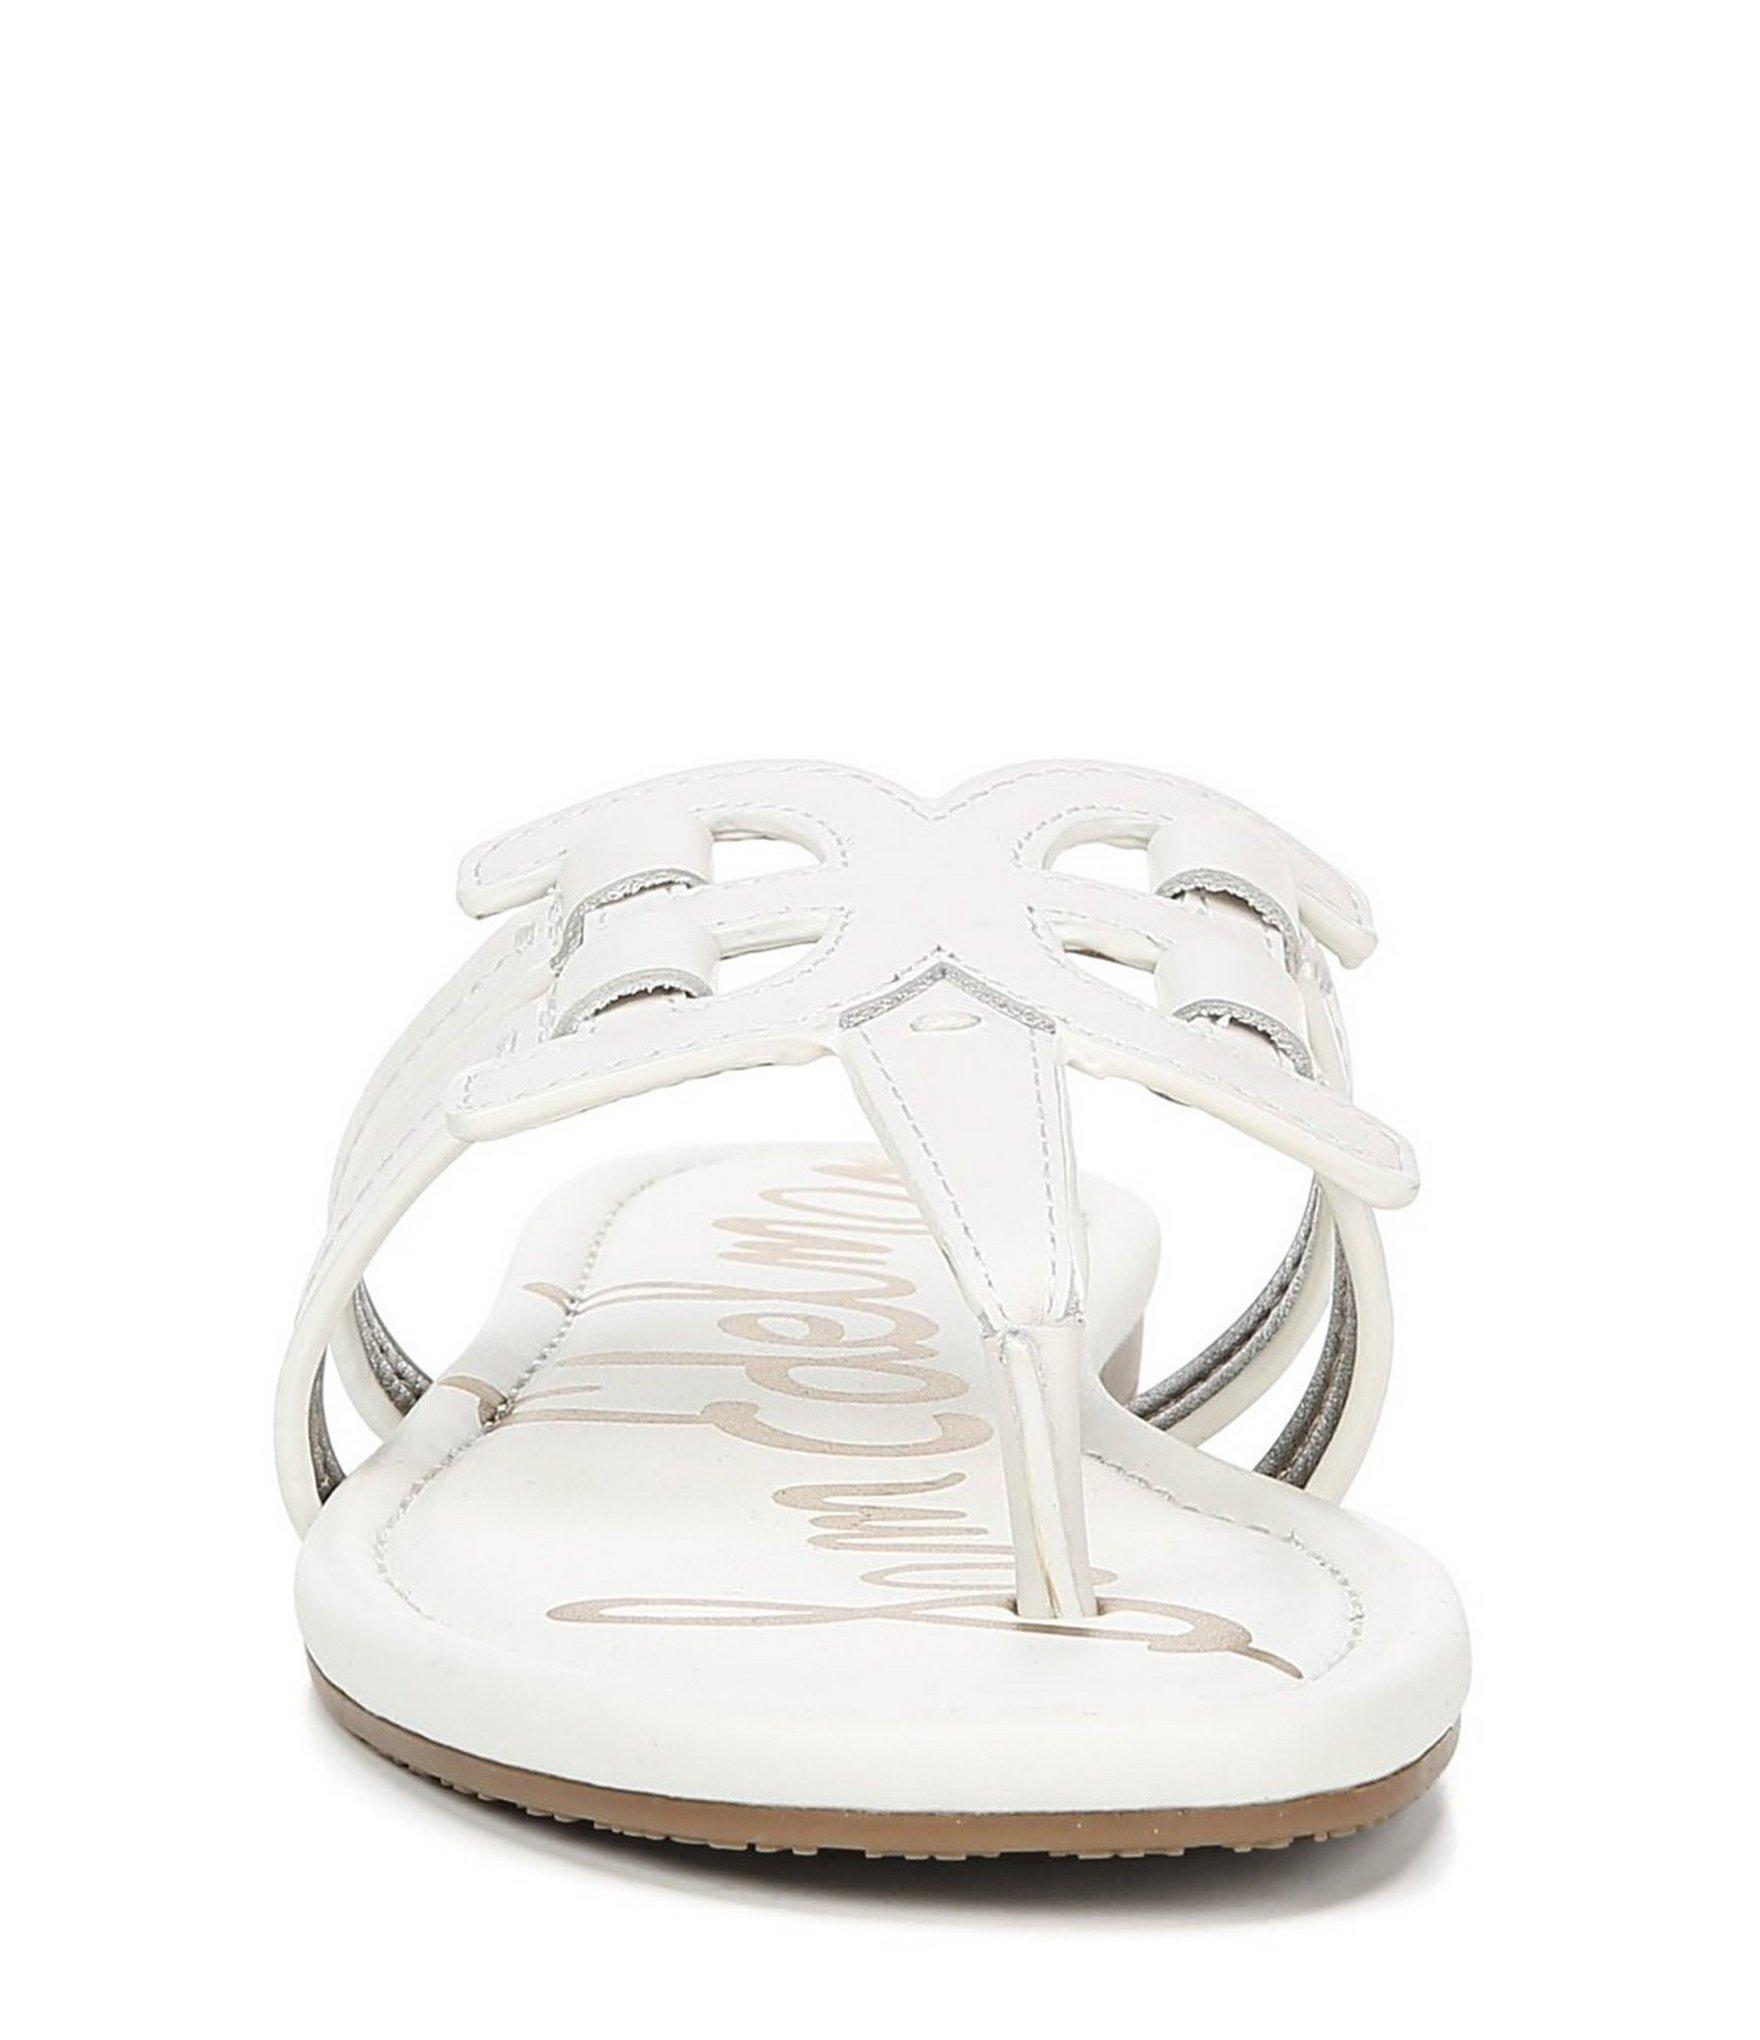 374abd6dd Lyst - Sam Edelman Cara Leather Double E Sandals in White